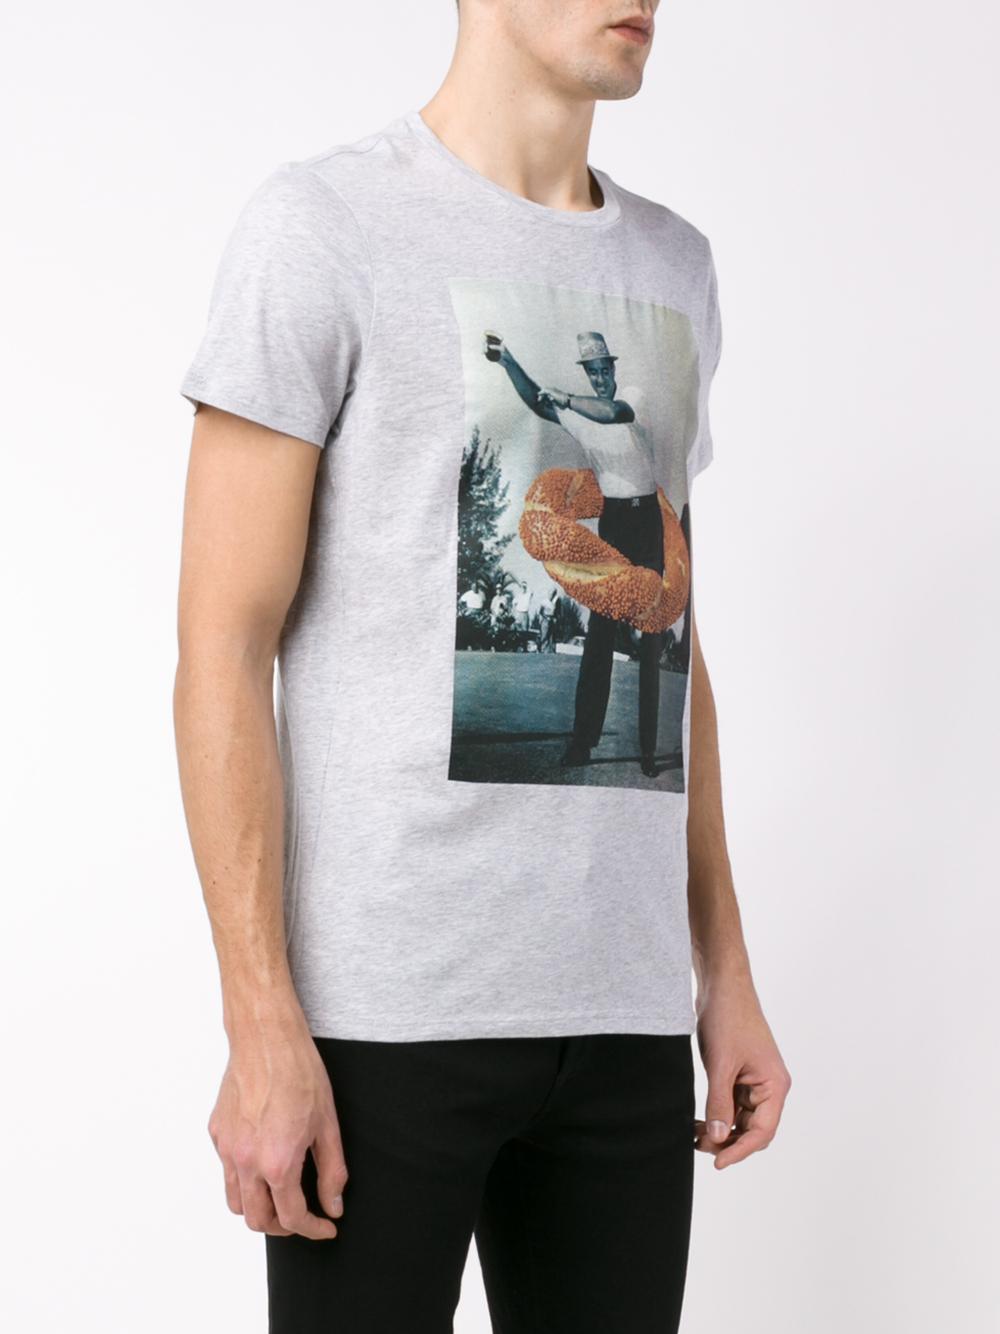 Les Benjamins Be Famous Or Die Cotton Jersey T: Les Benjamins Hulahoop T-shirt In White For Men